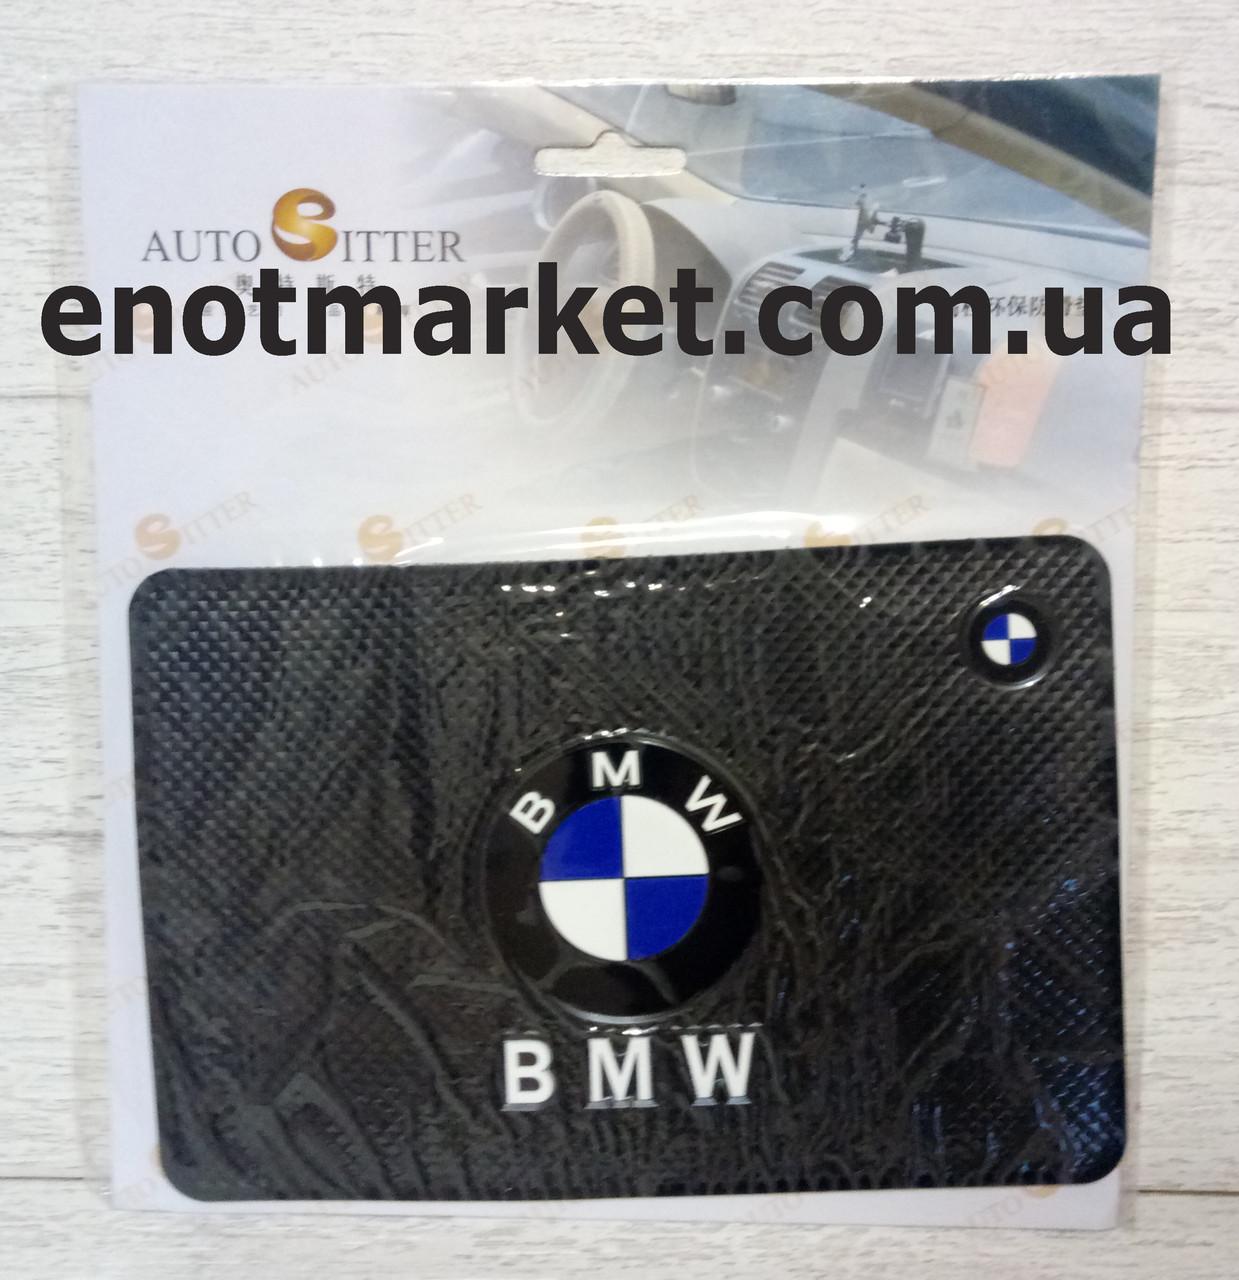 "Коврик-держатель антискользящий липкий на торпеду автомобиля c логотипом ""BMW"" для телефона"